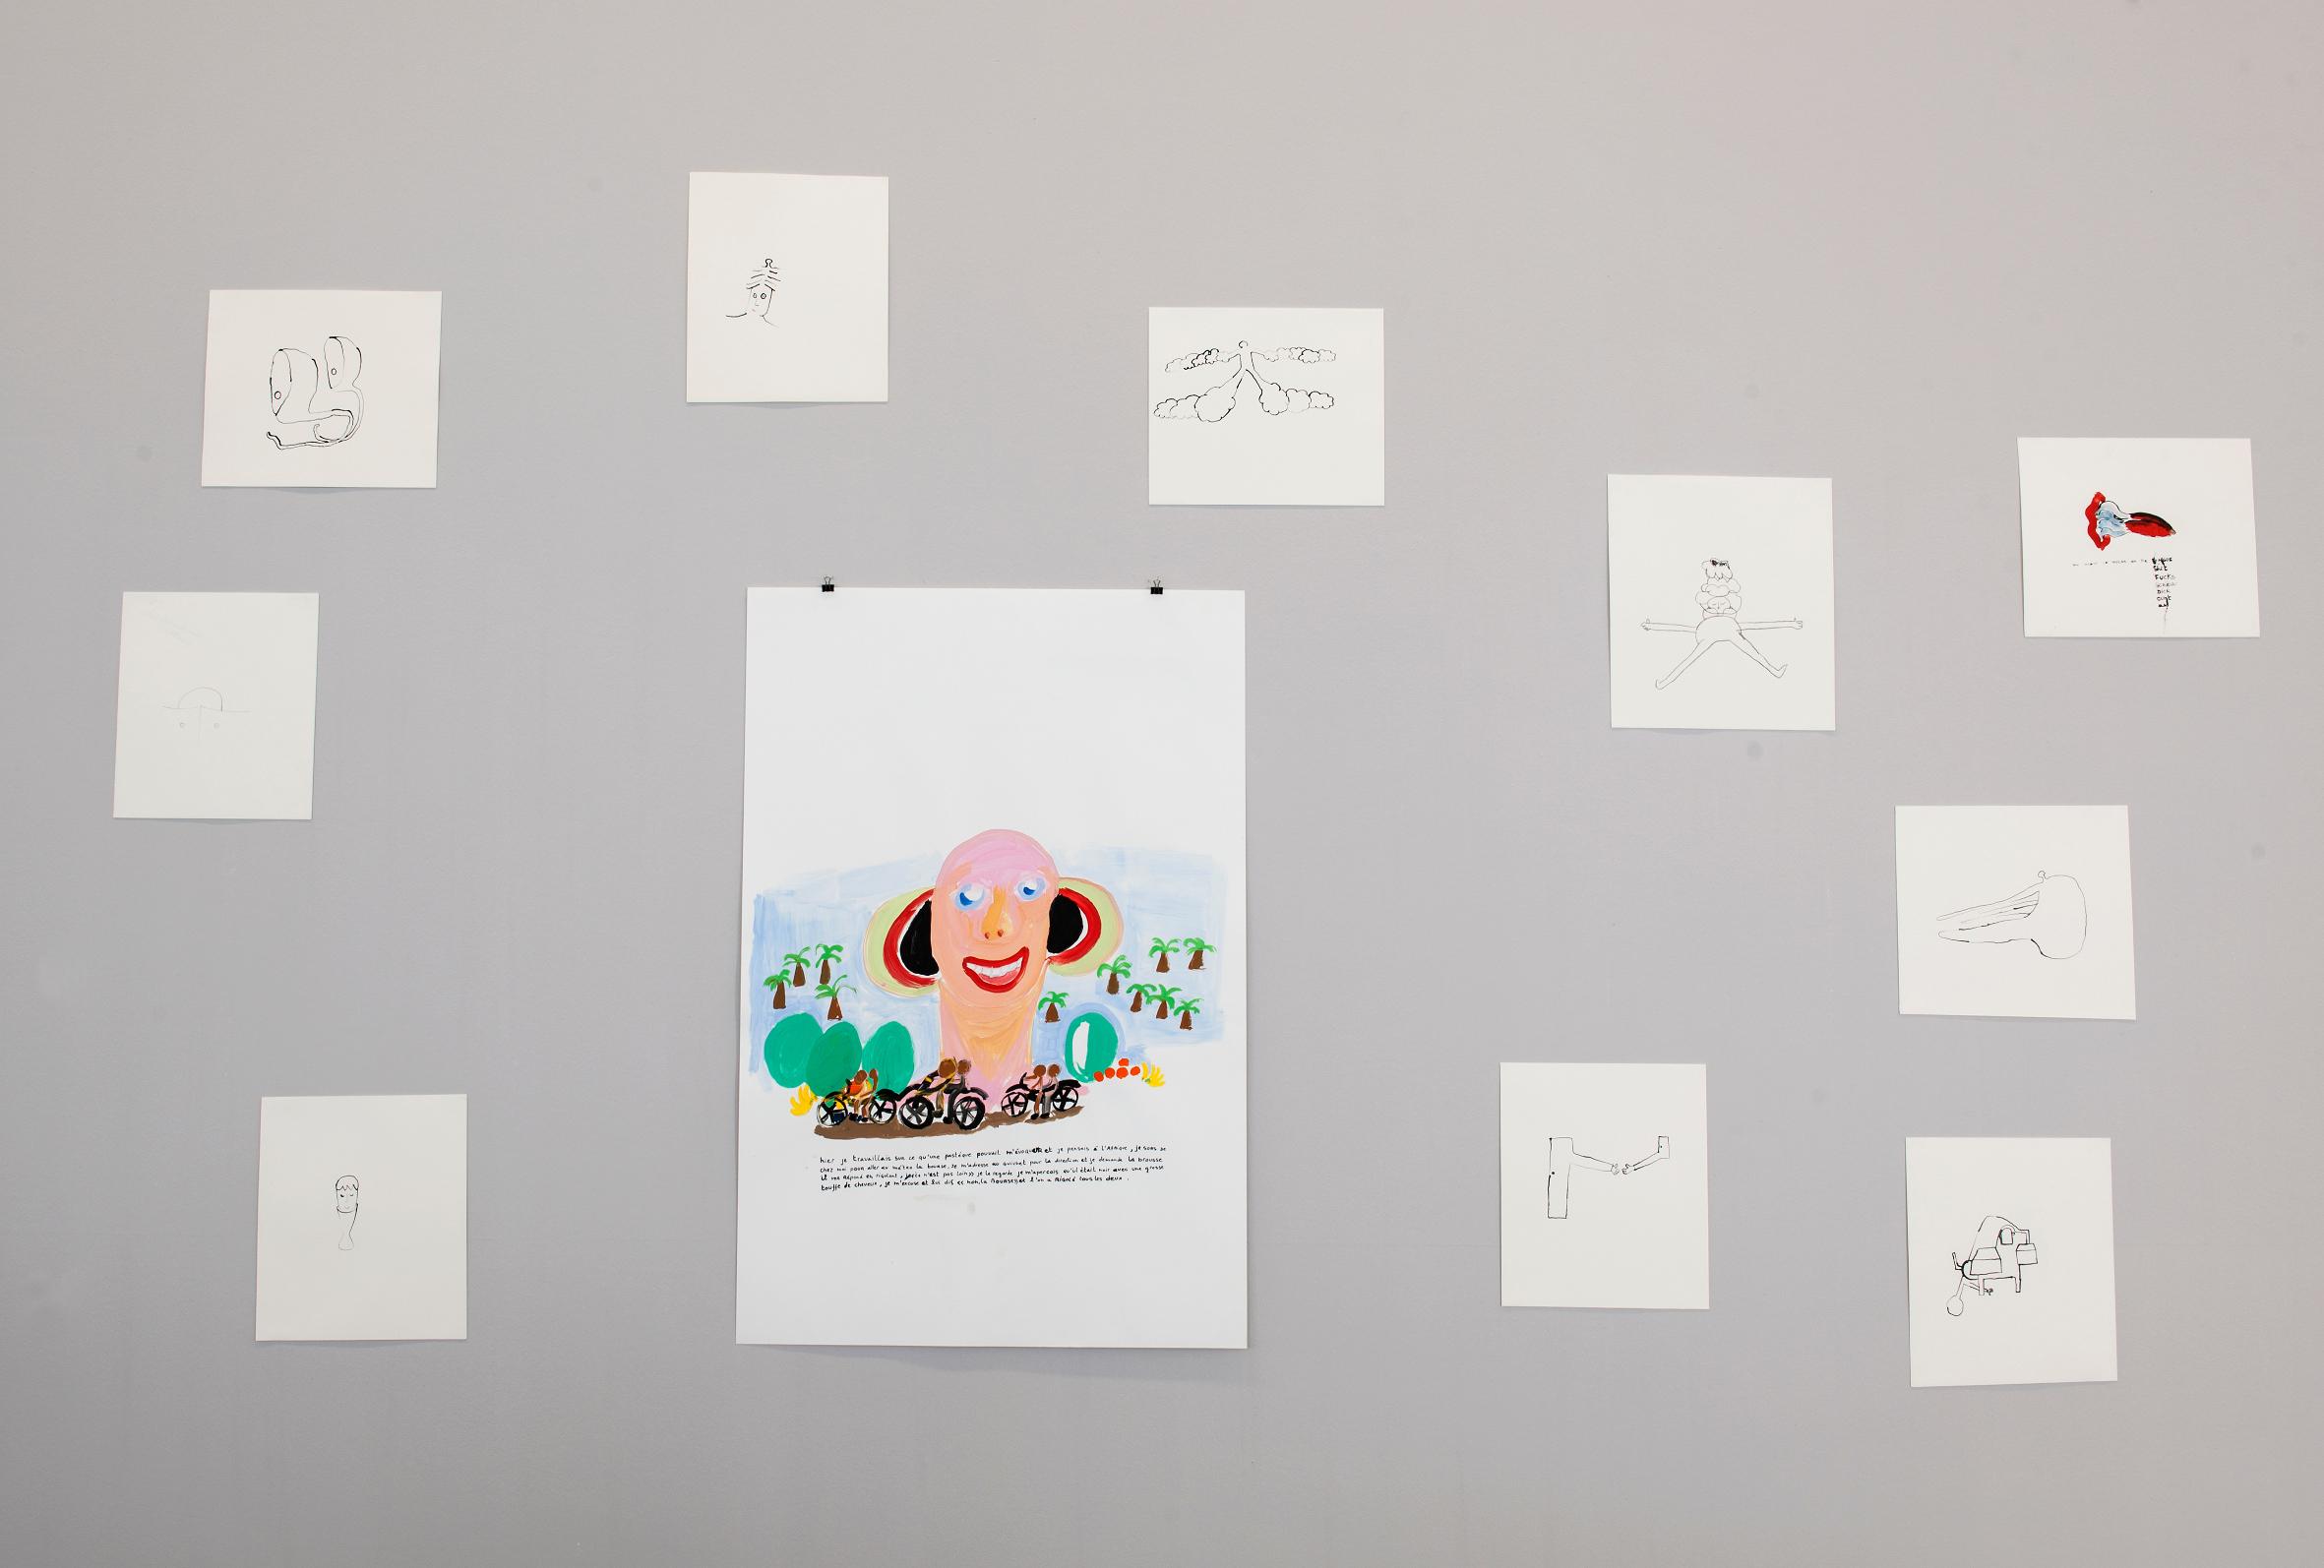 MAC's, Vue de l'exposition Ritournelle Anne-Marie Schneider © Philippe De Gobert